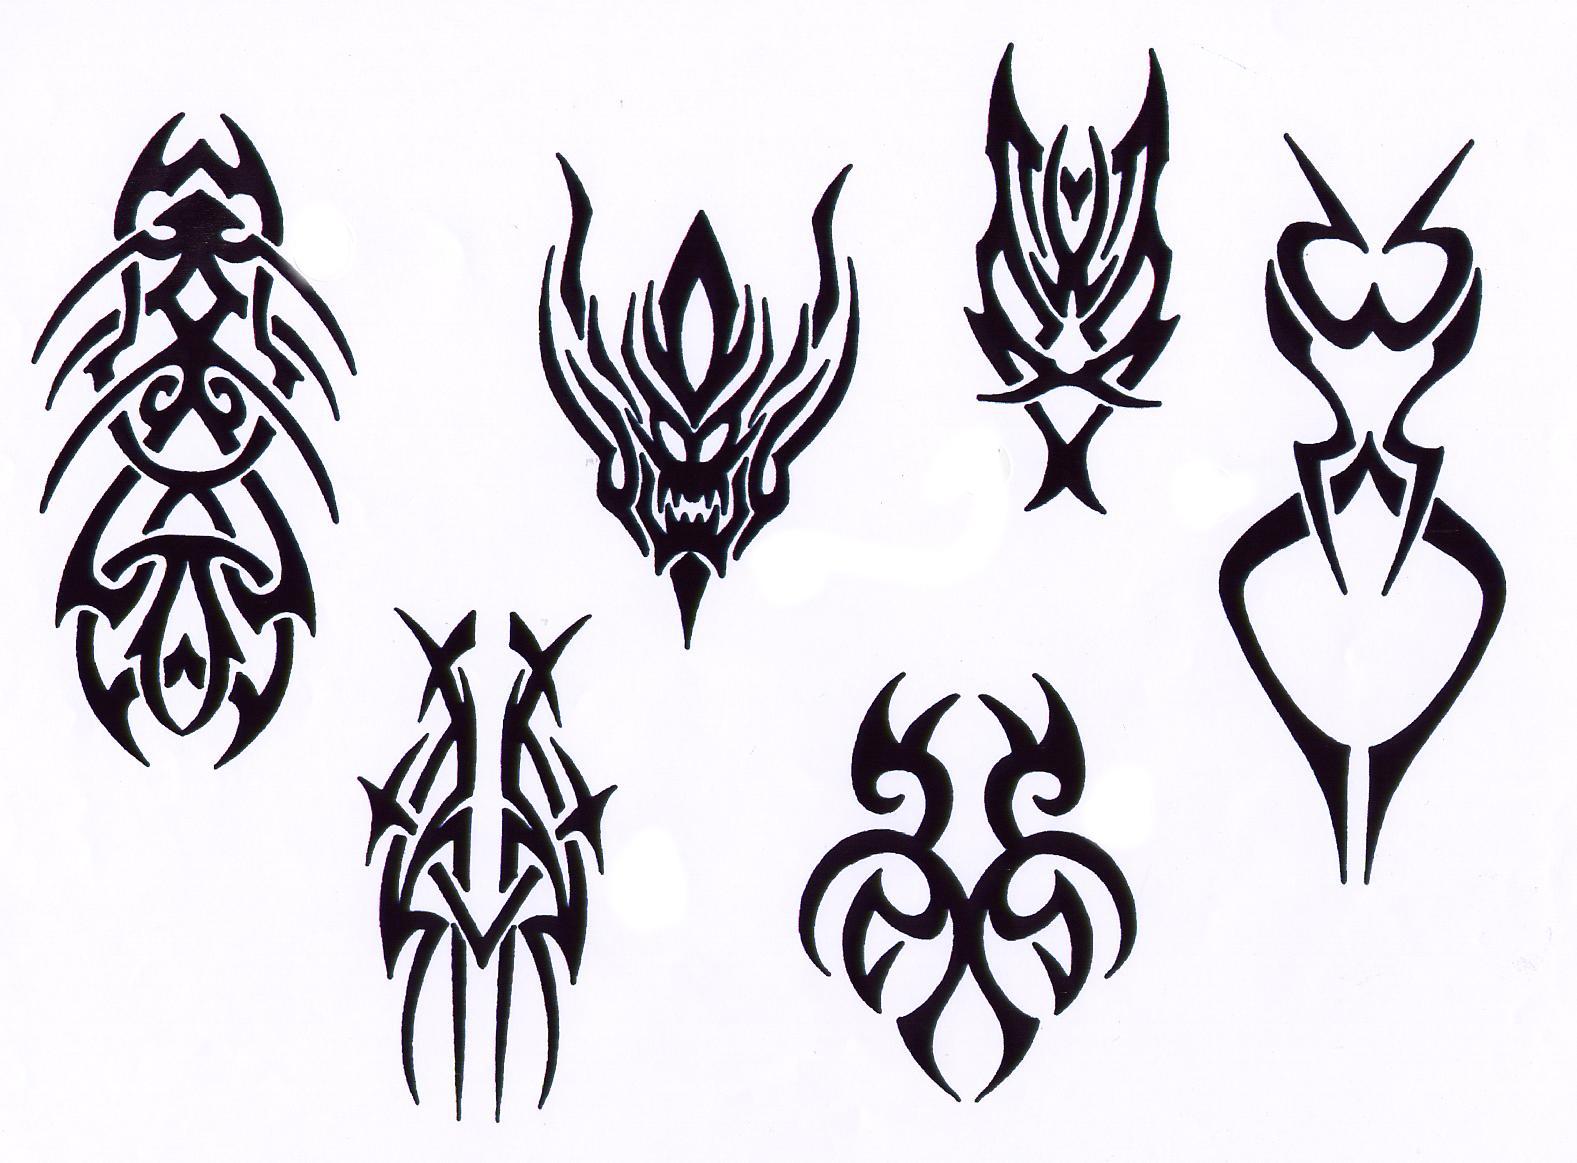 tribal tattoo designs clipart best. Black Bedroom Furniture Sets. Home Design Ideas